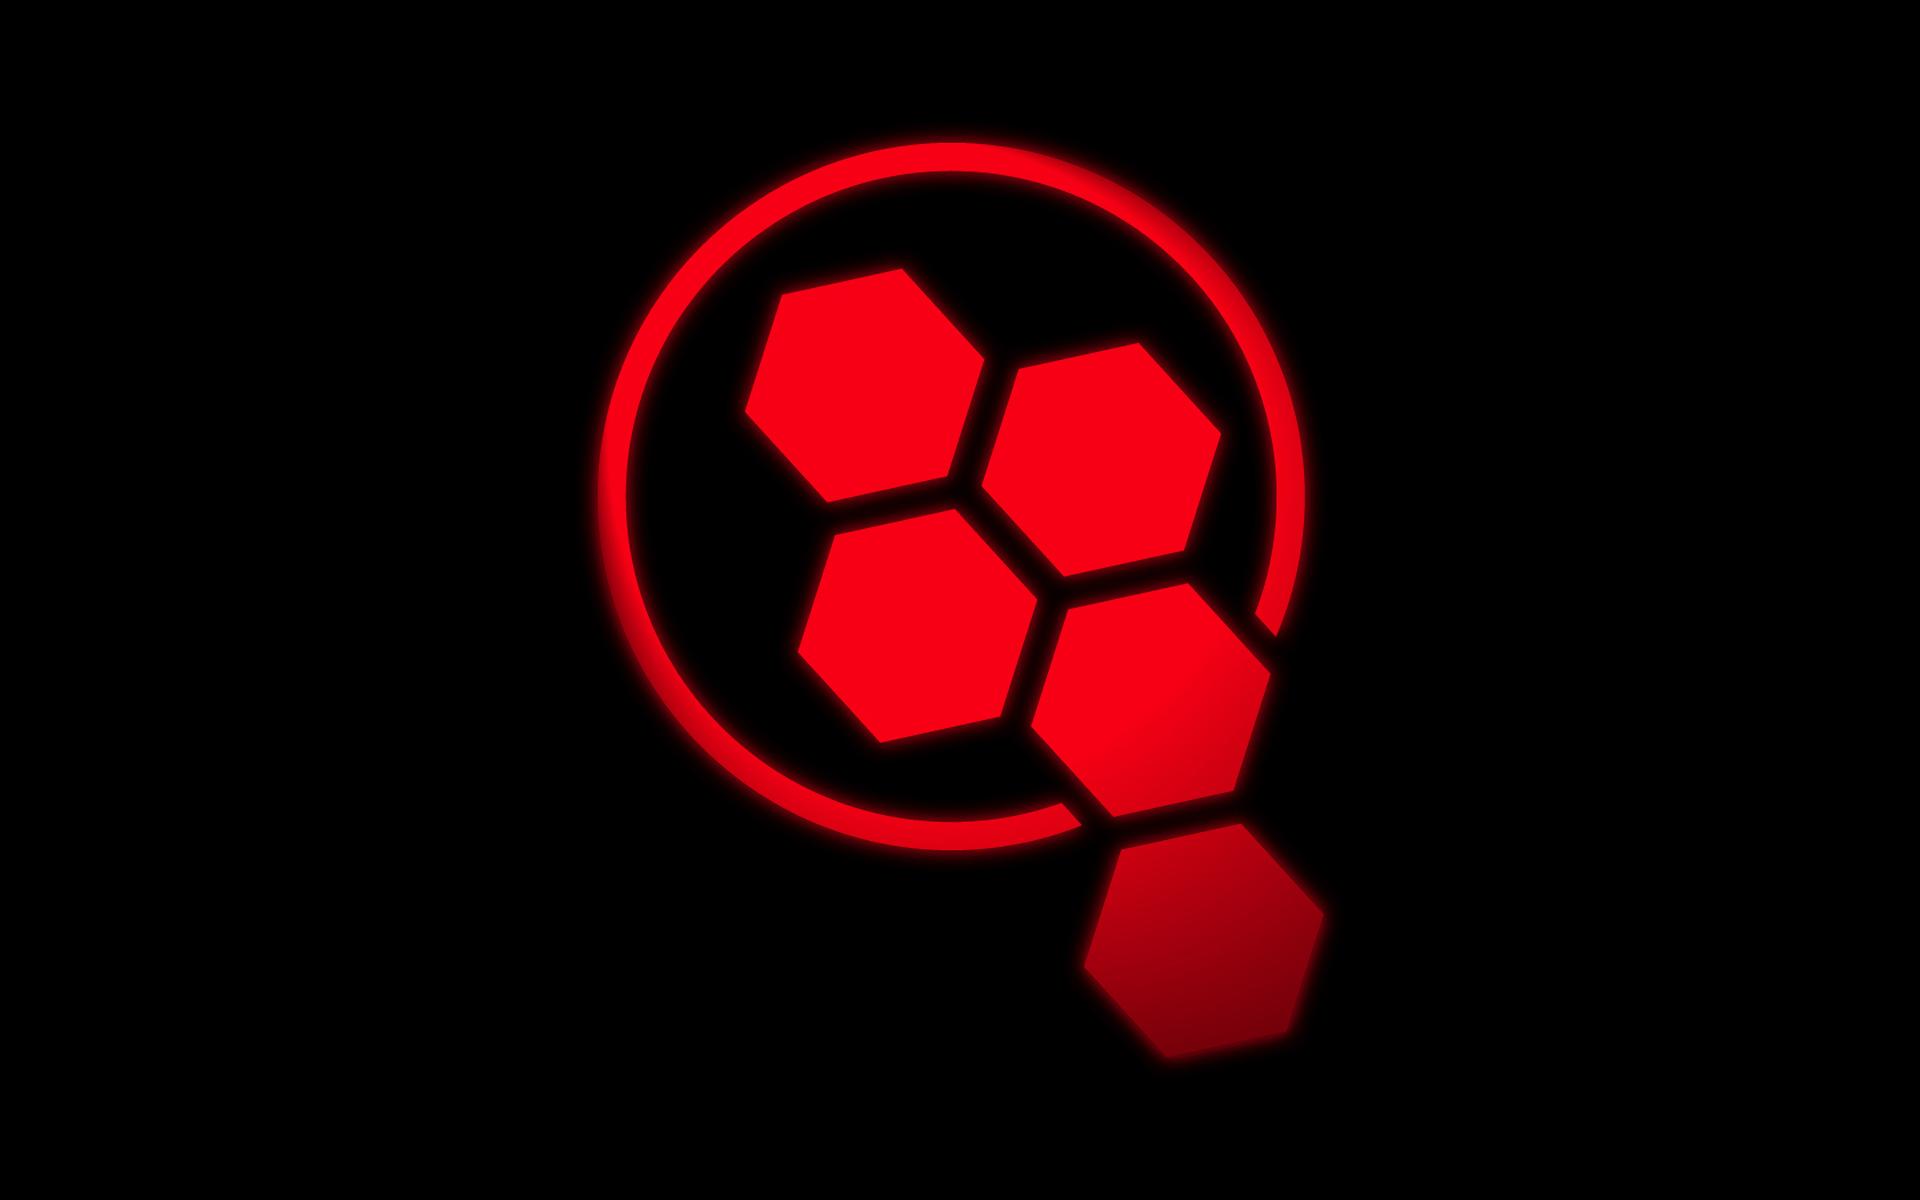 Wallpaper Heart Red Logo Circle Ball Arcade Capcom Xbox 360